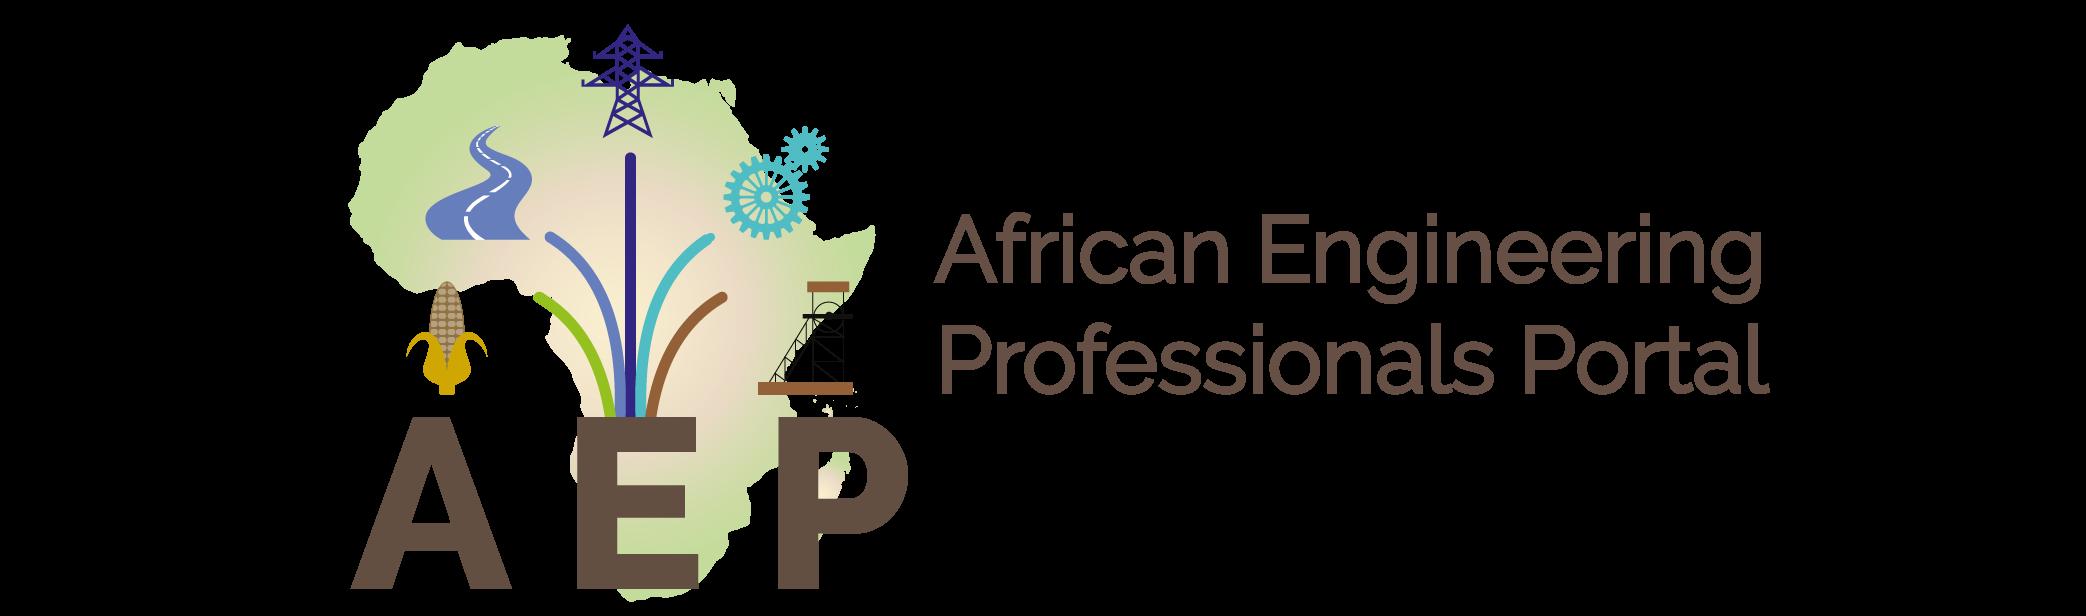 African Engineering Professionals Portal